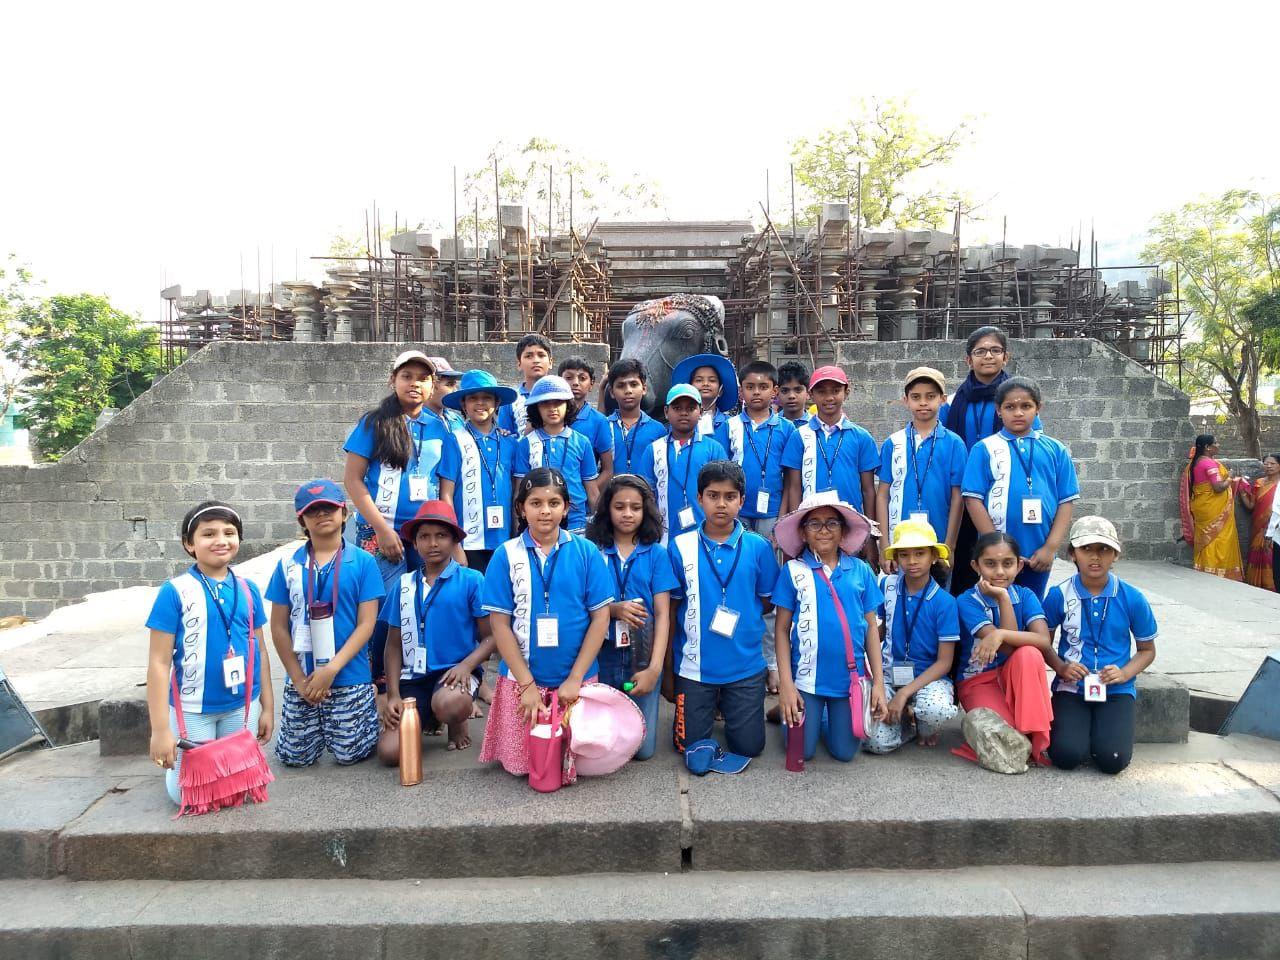 Upper Elementary students' fun filled trip to Warangal